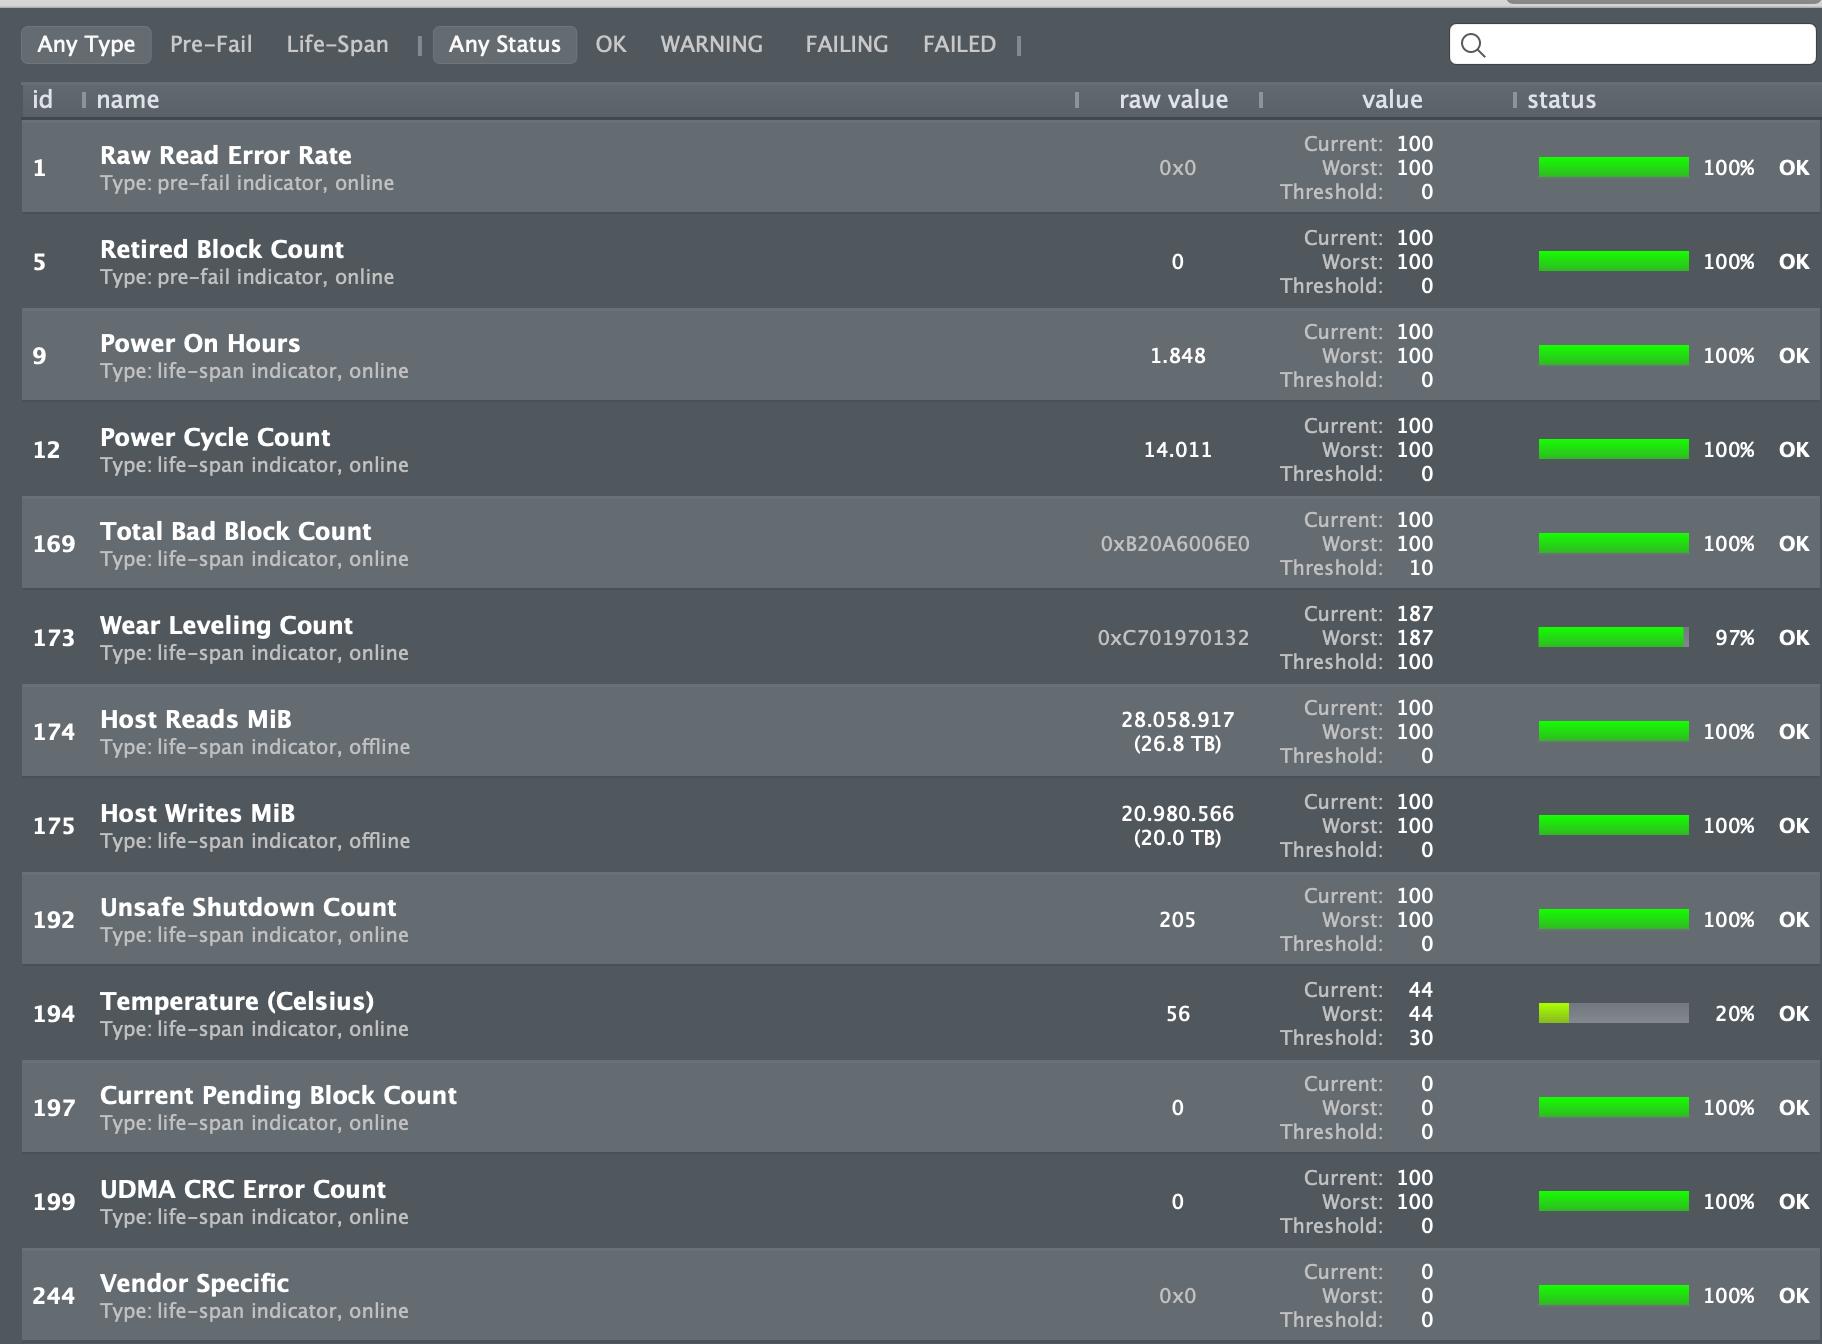 https://tweakers.net/i/SpBZ97oA6cAp5RBIsJhoe4aIdYs=/full-fit-in/4000x4000/filters:no_upscale():fill(white):strip_exif()/f/image/KnSrX3a6Zunzg4IDVcnpPktr.png?f=user_large